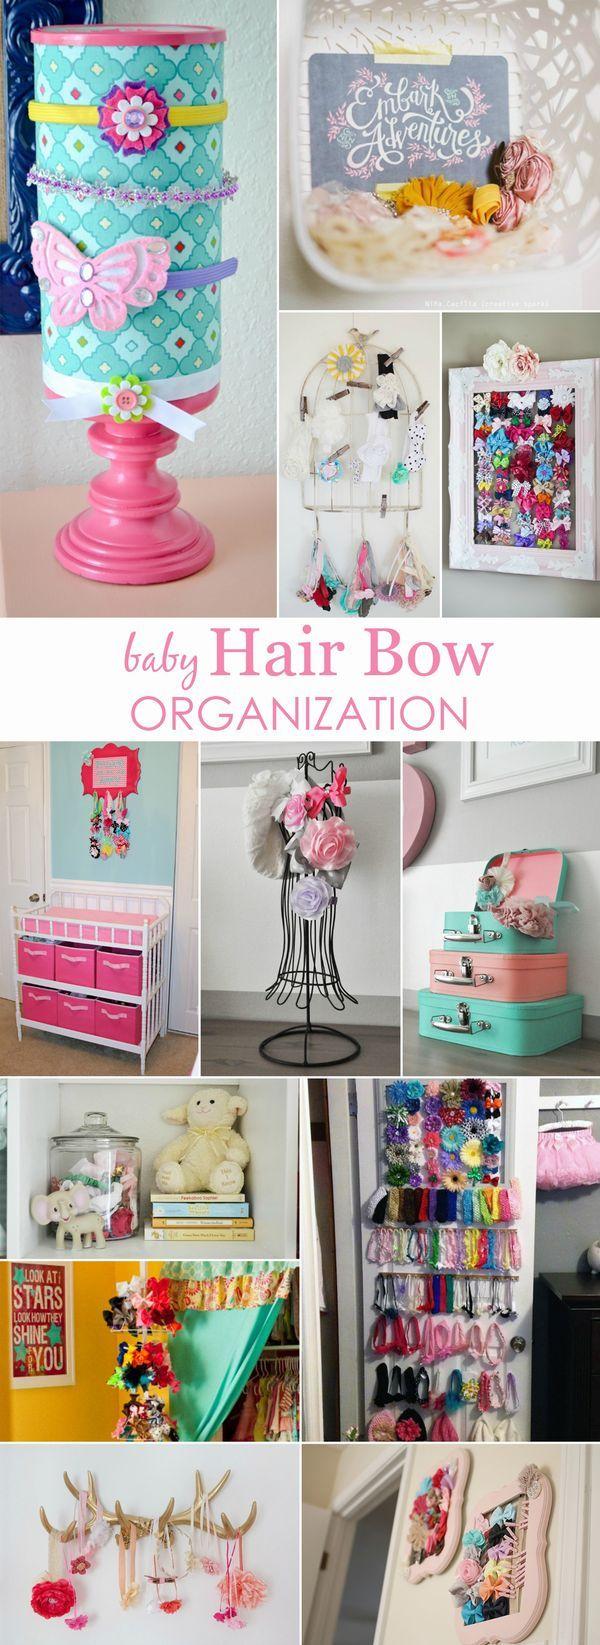 Creative Ways to Organize Baby Bows and Headbands #kids #girls #organization